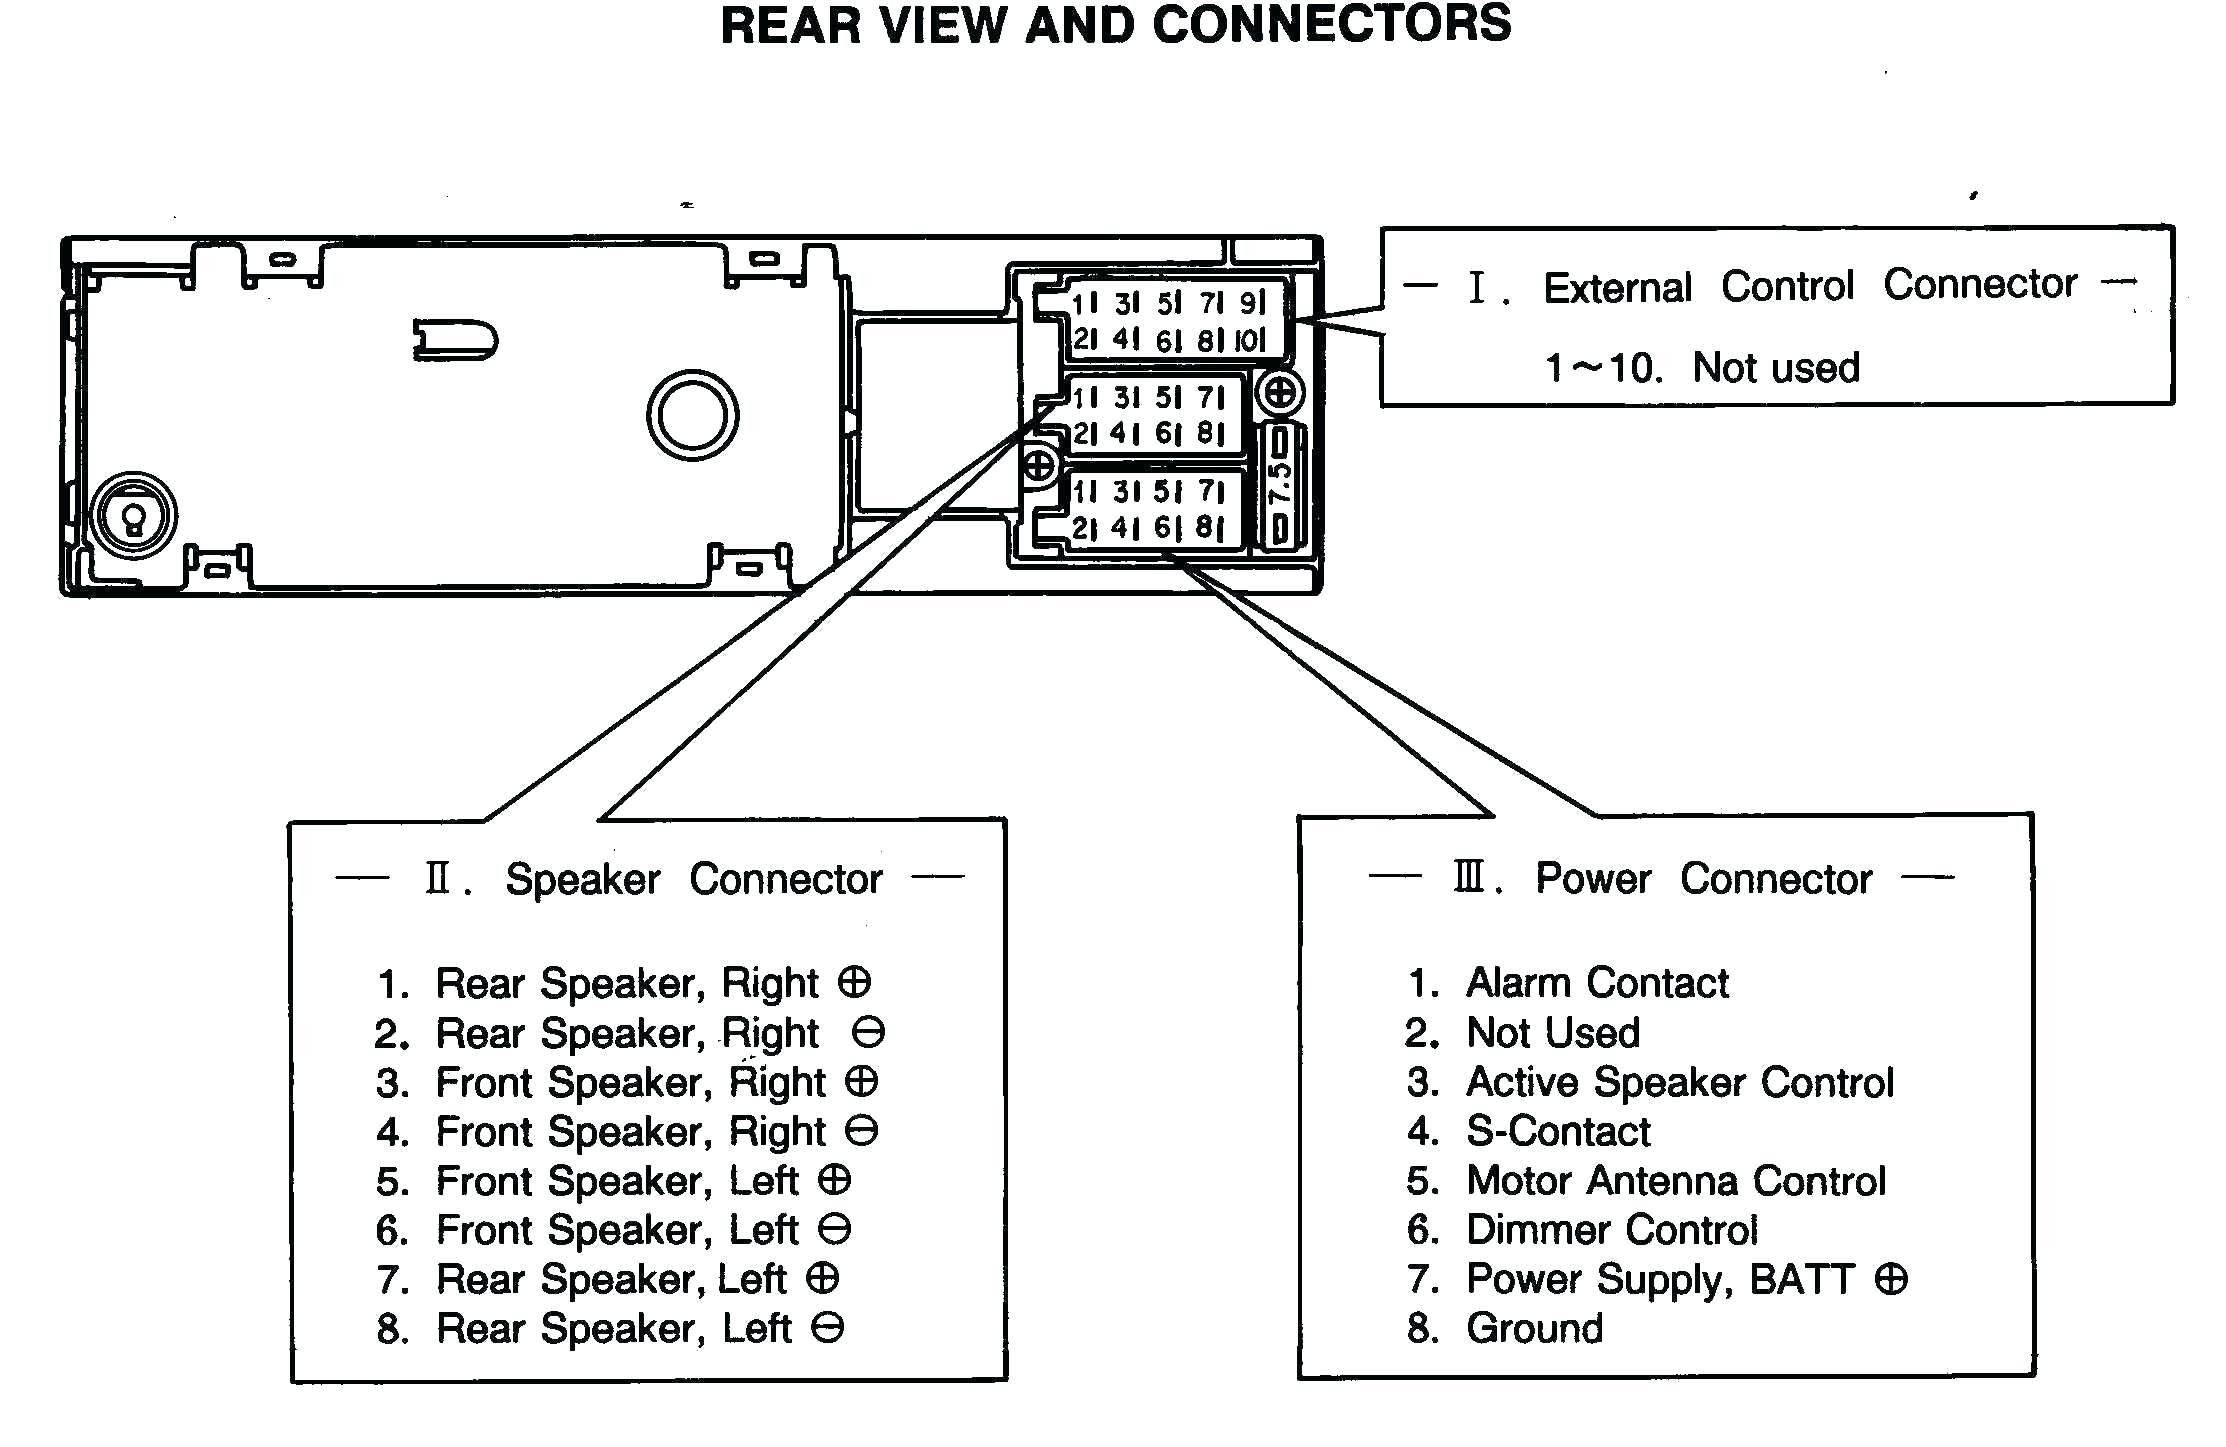 DIAGRAM] Bmw E46 Dme Wiring Diagram FULL Version HD Quality Wiring Diagram  - FACEWIRINGGUIDE.WEBGIF.ITWebgif.it